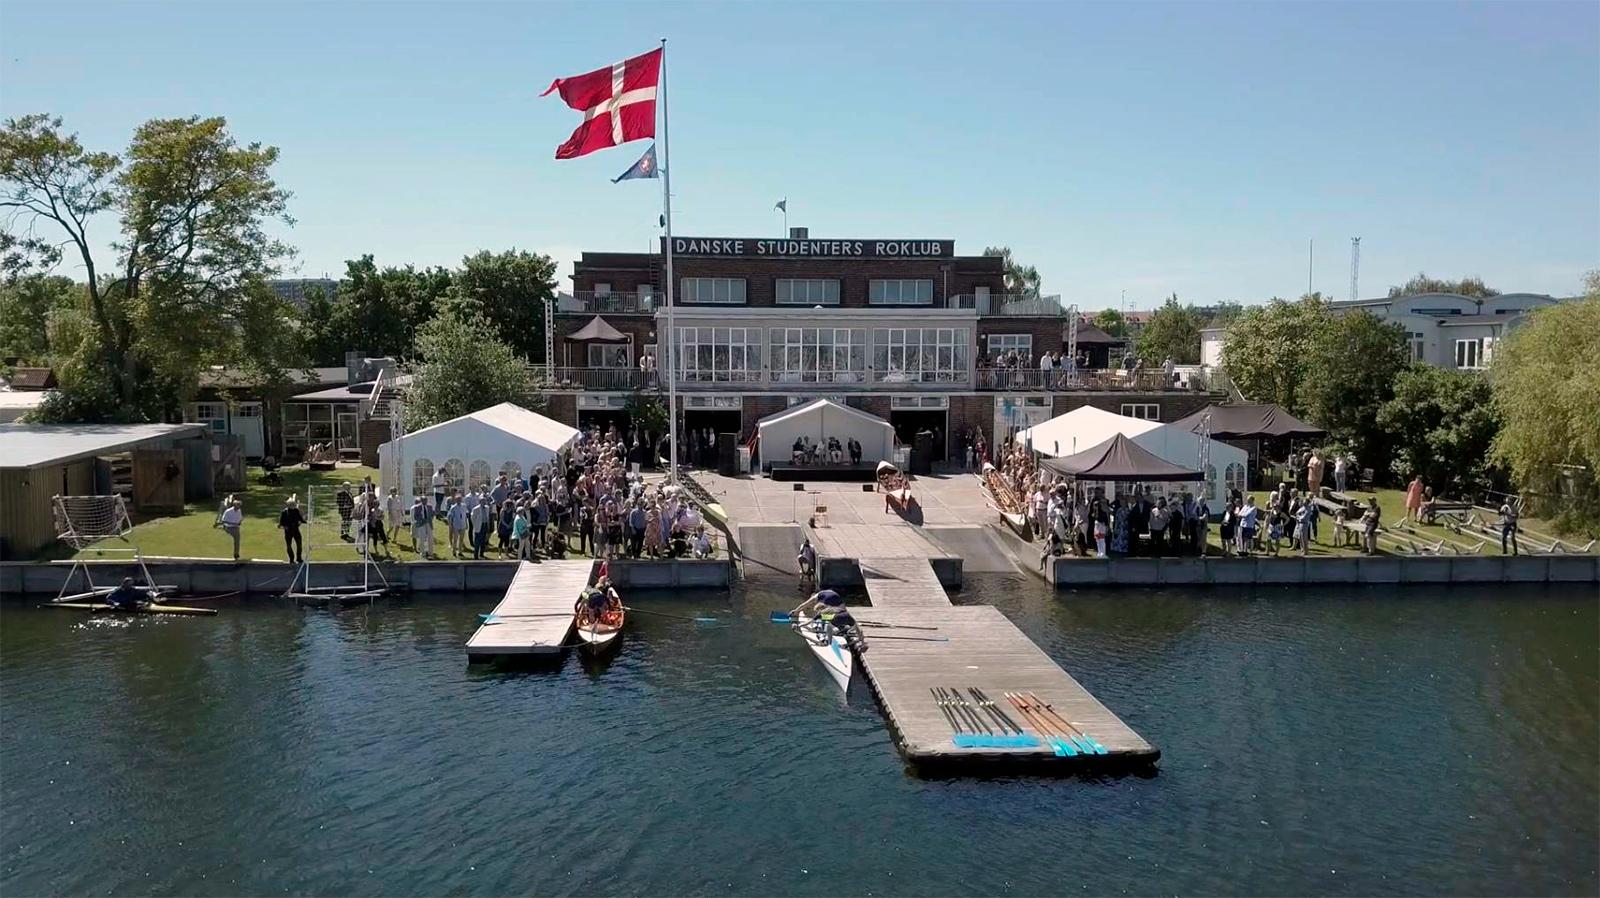 Danske Studenters Roklub